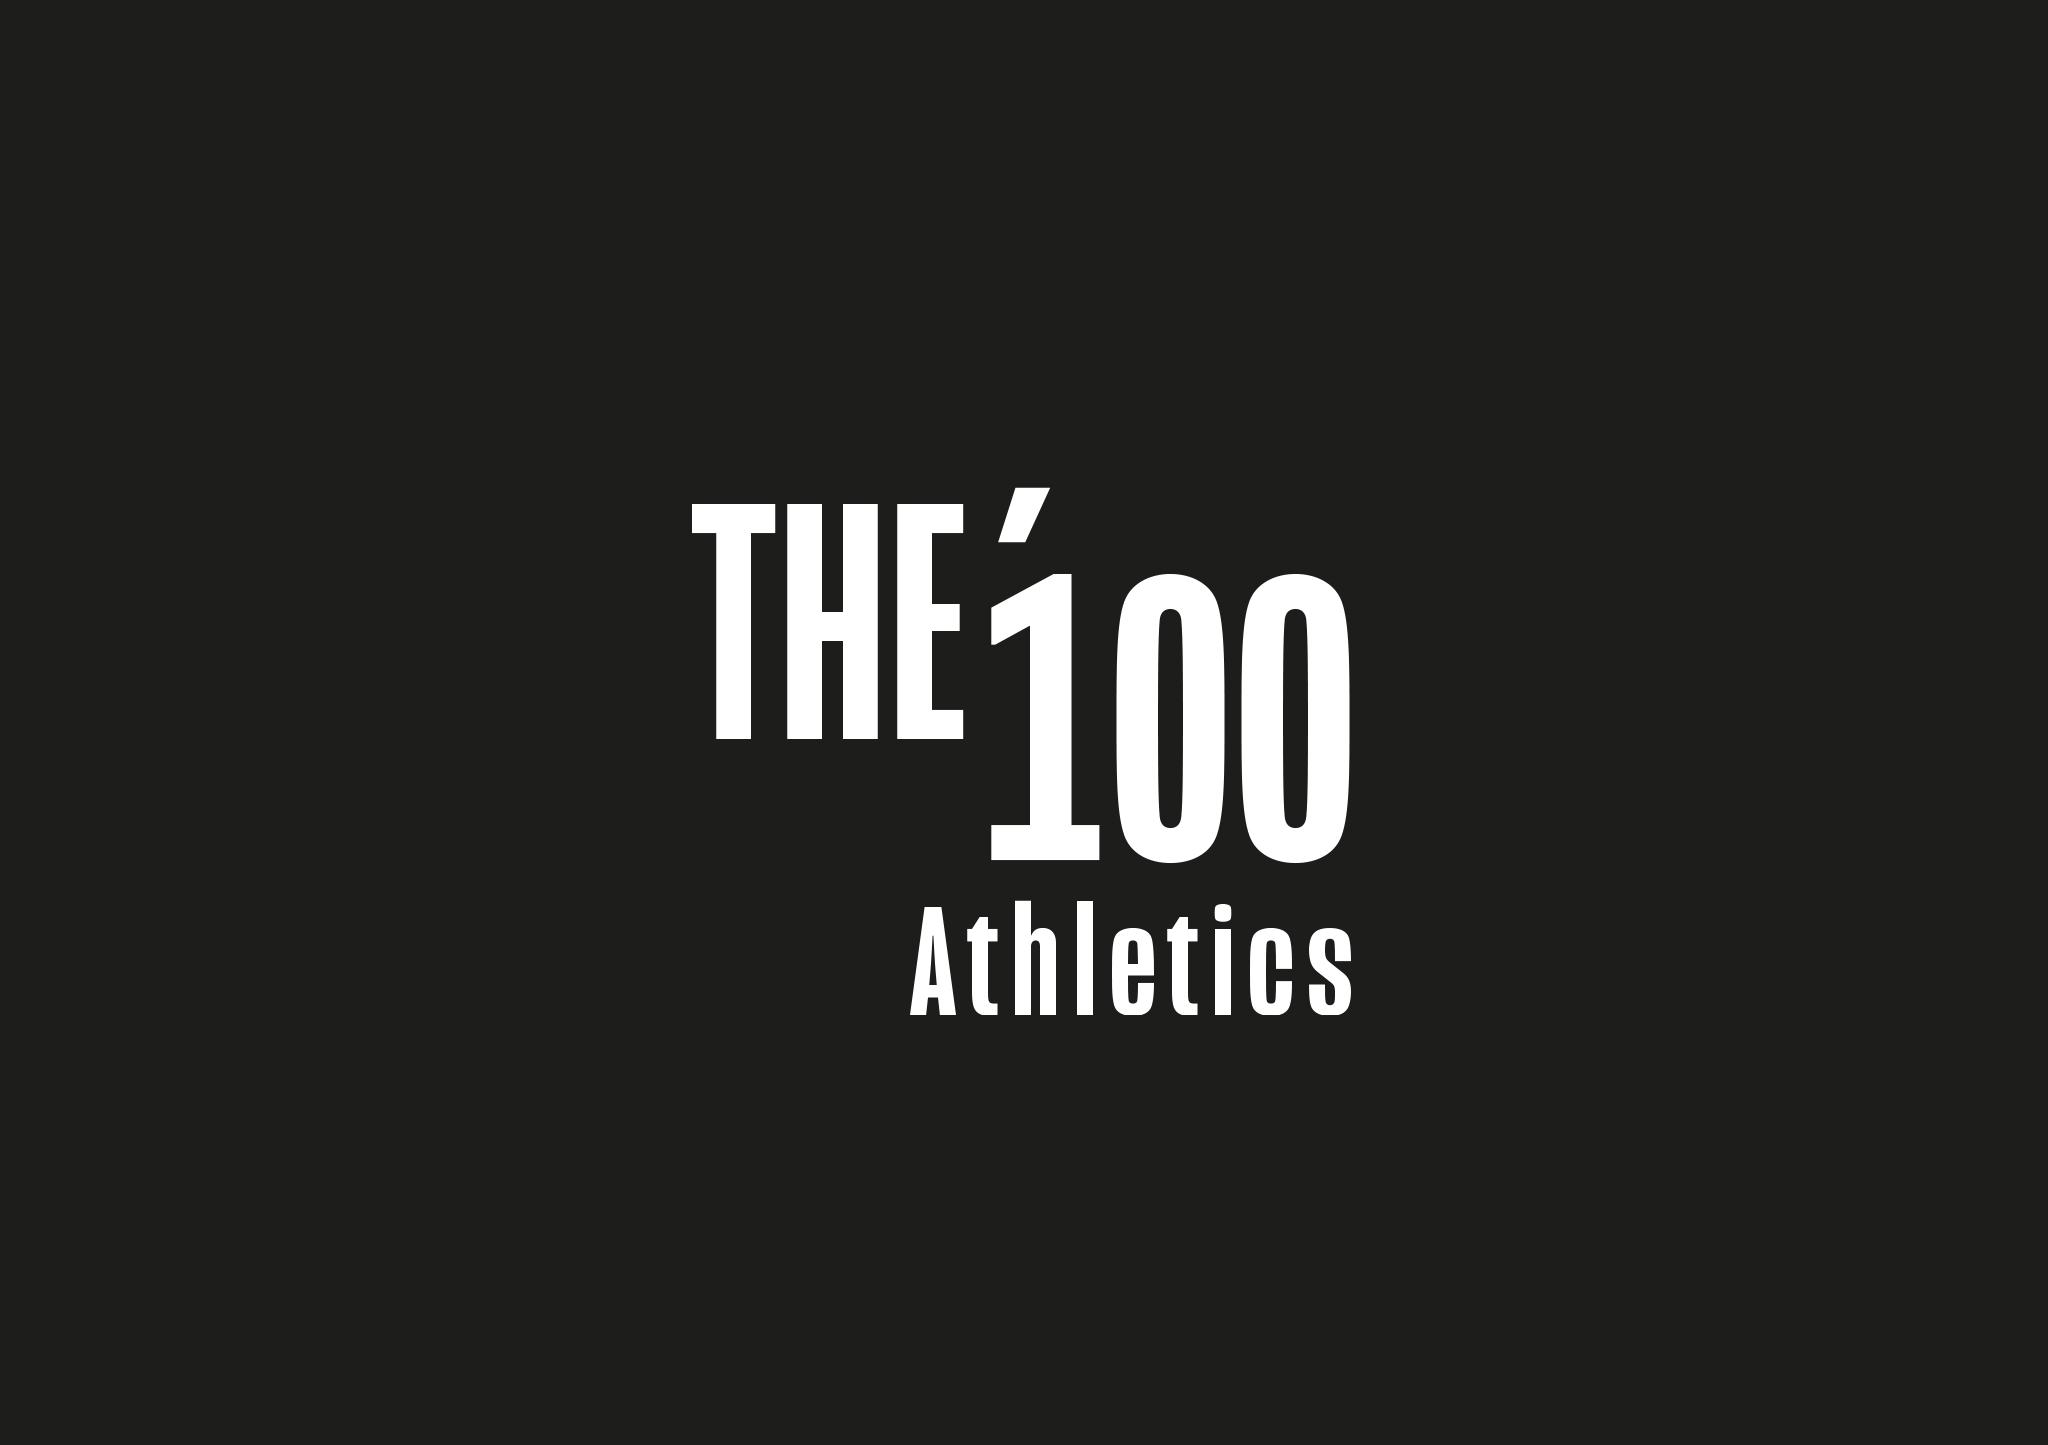 The 100 Athletics